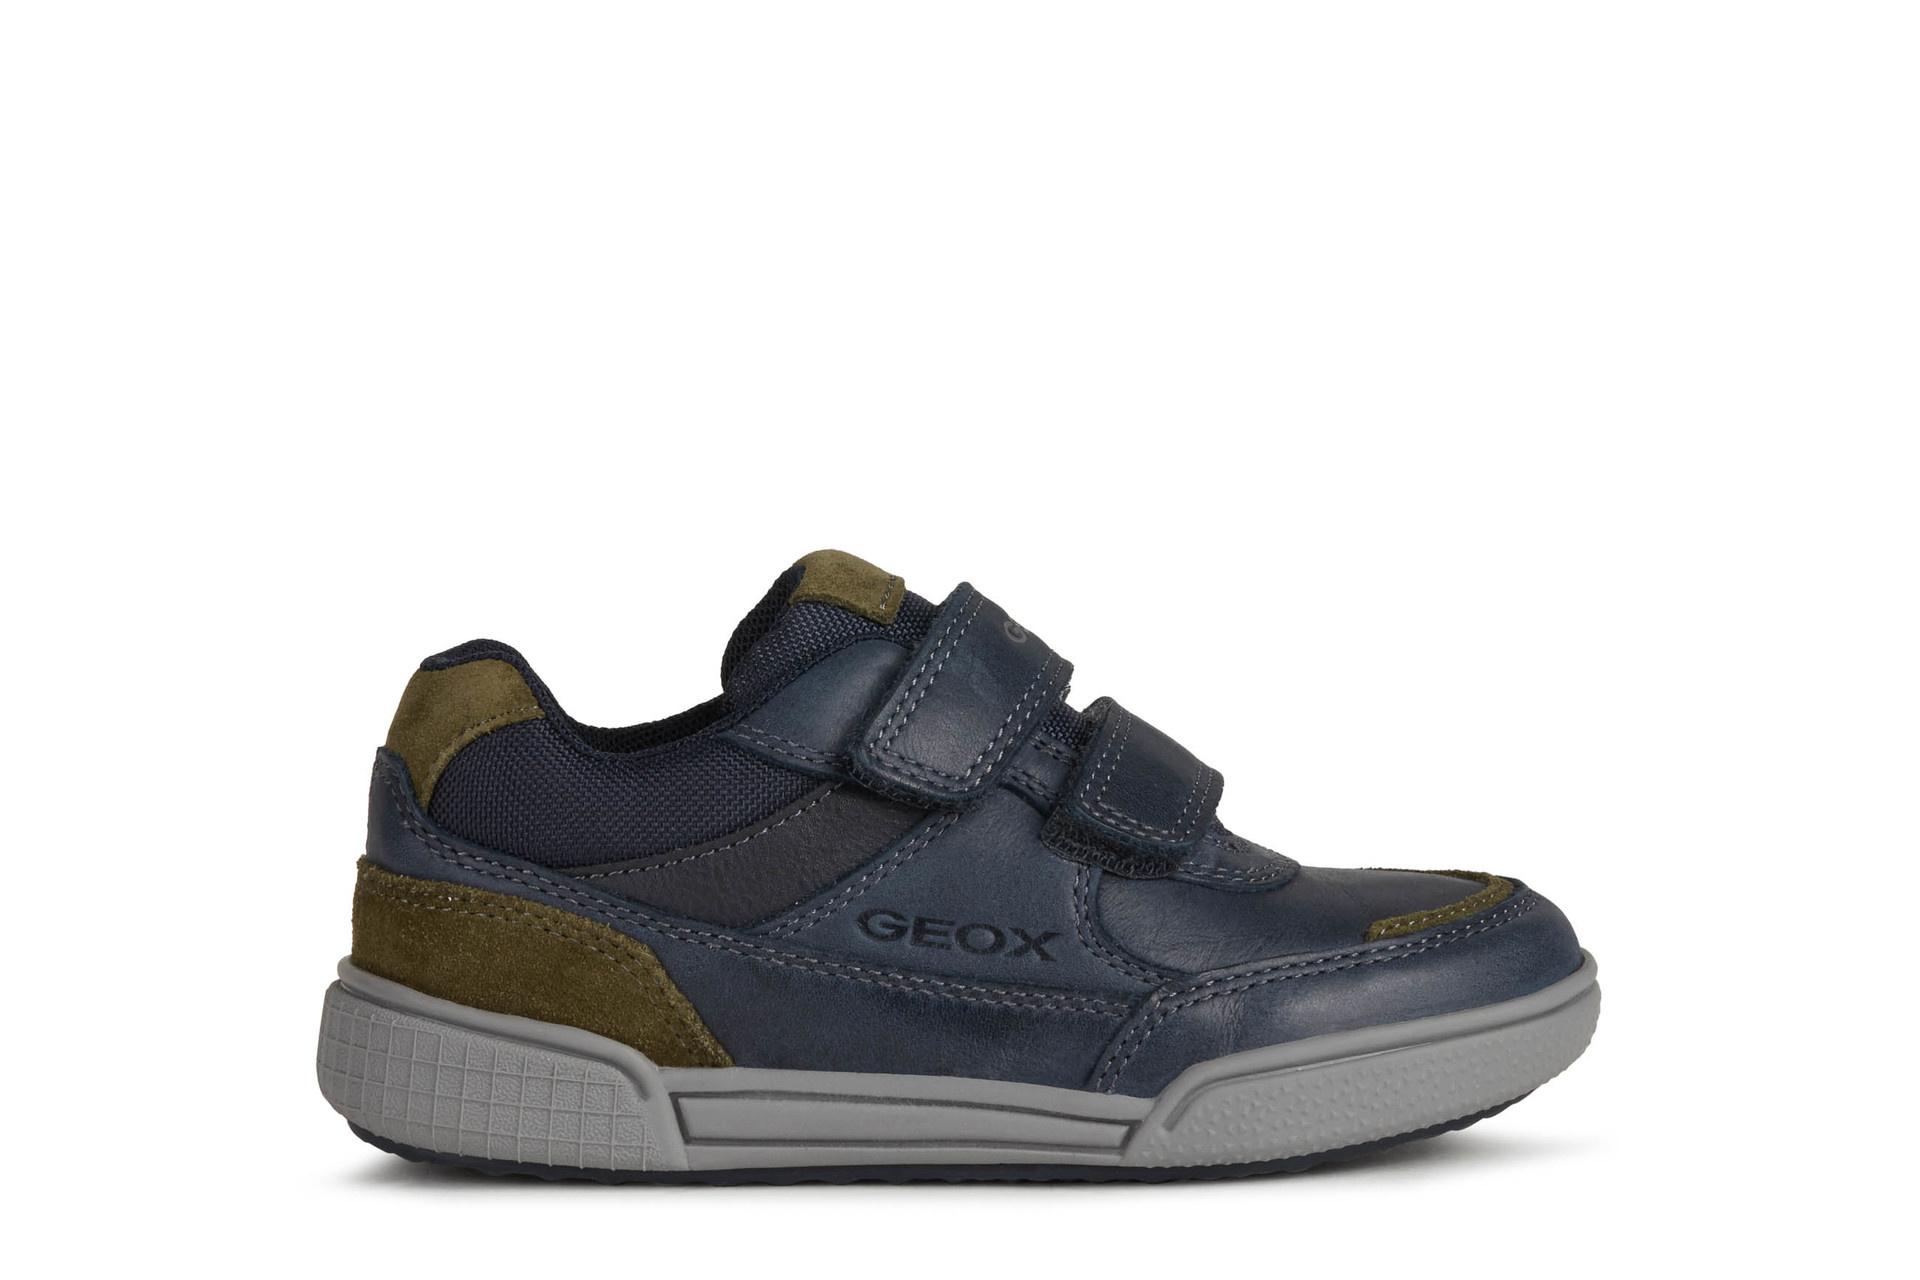 Geox Poseido Navy/Military